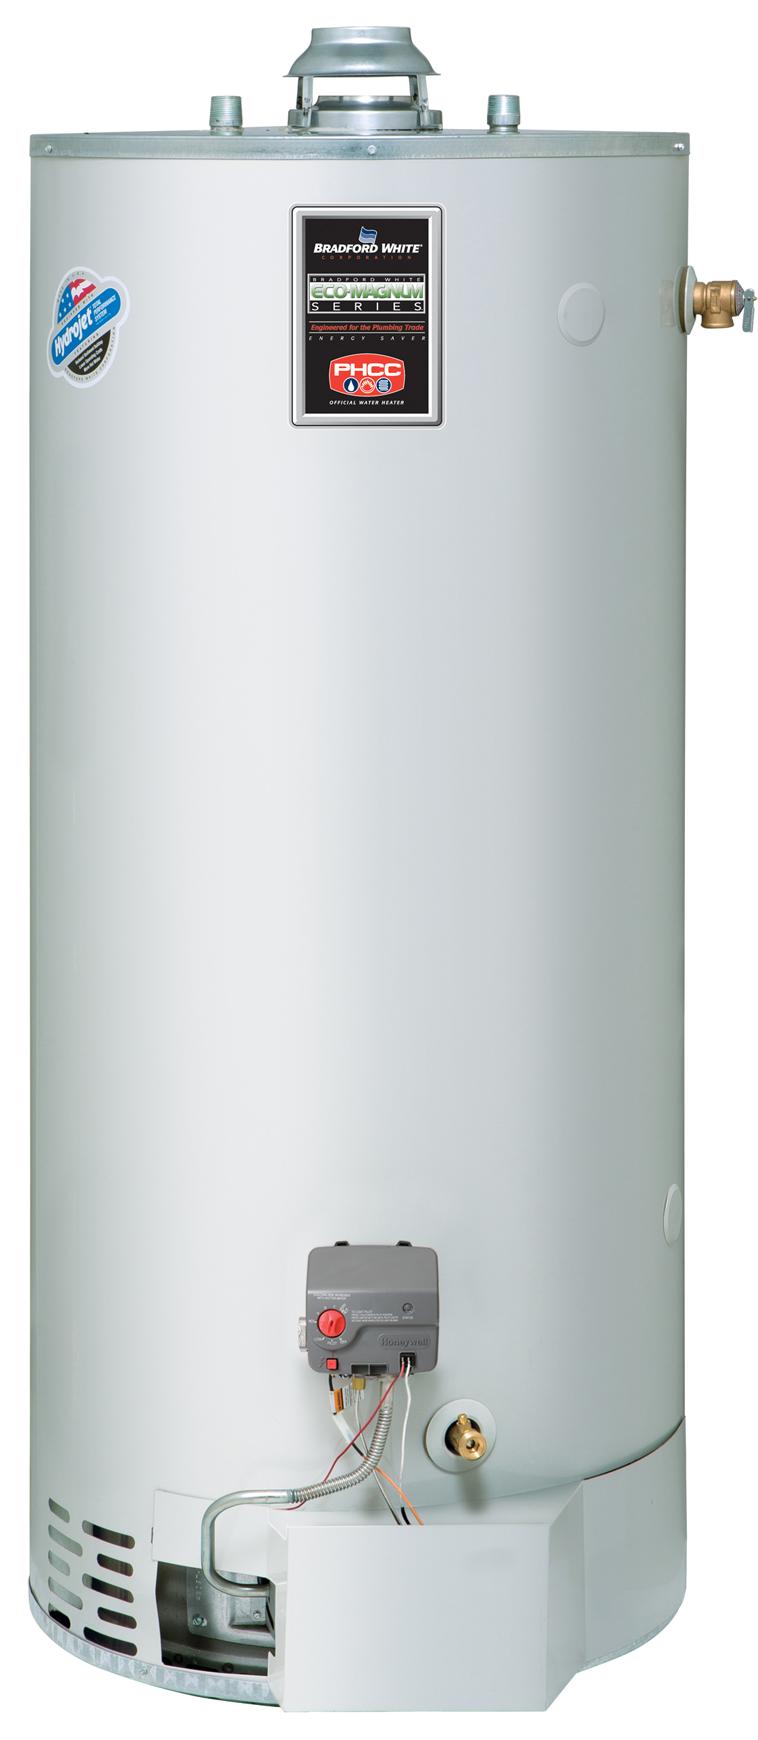 Rheem Bradford White Ao Smith Water Heater